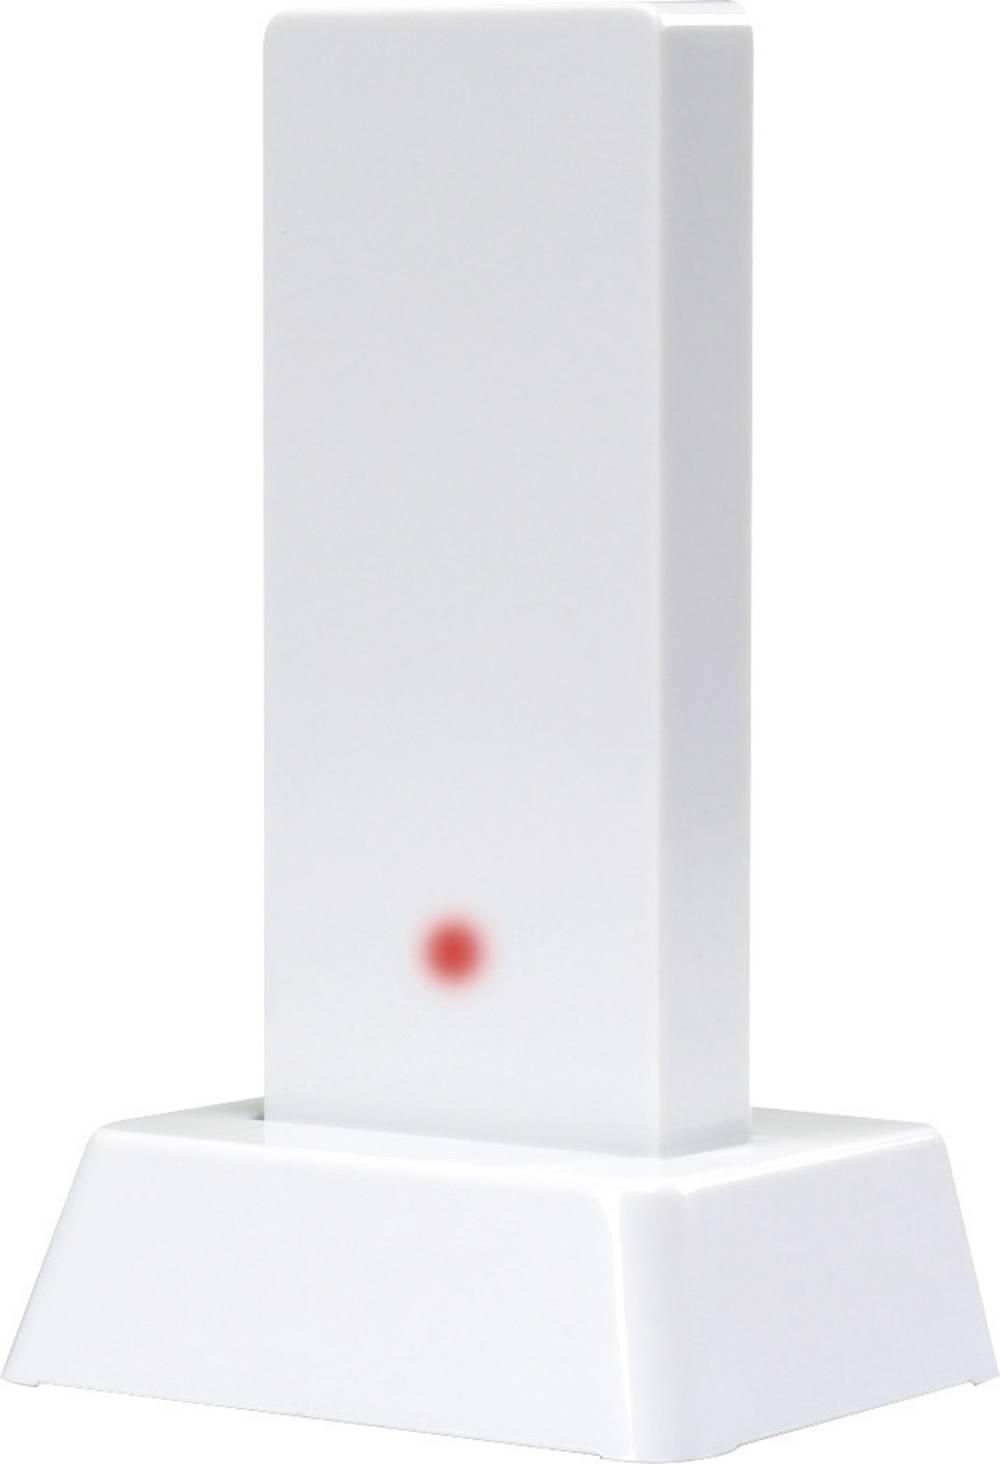 Termometer/higrometer A460 Renkforce, Bluetooth